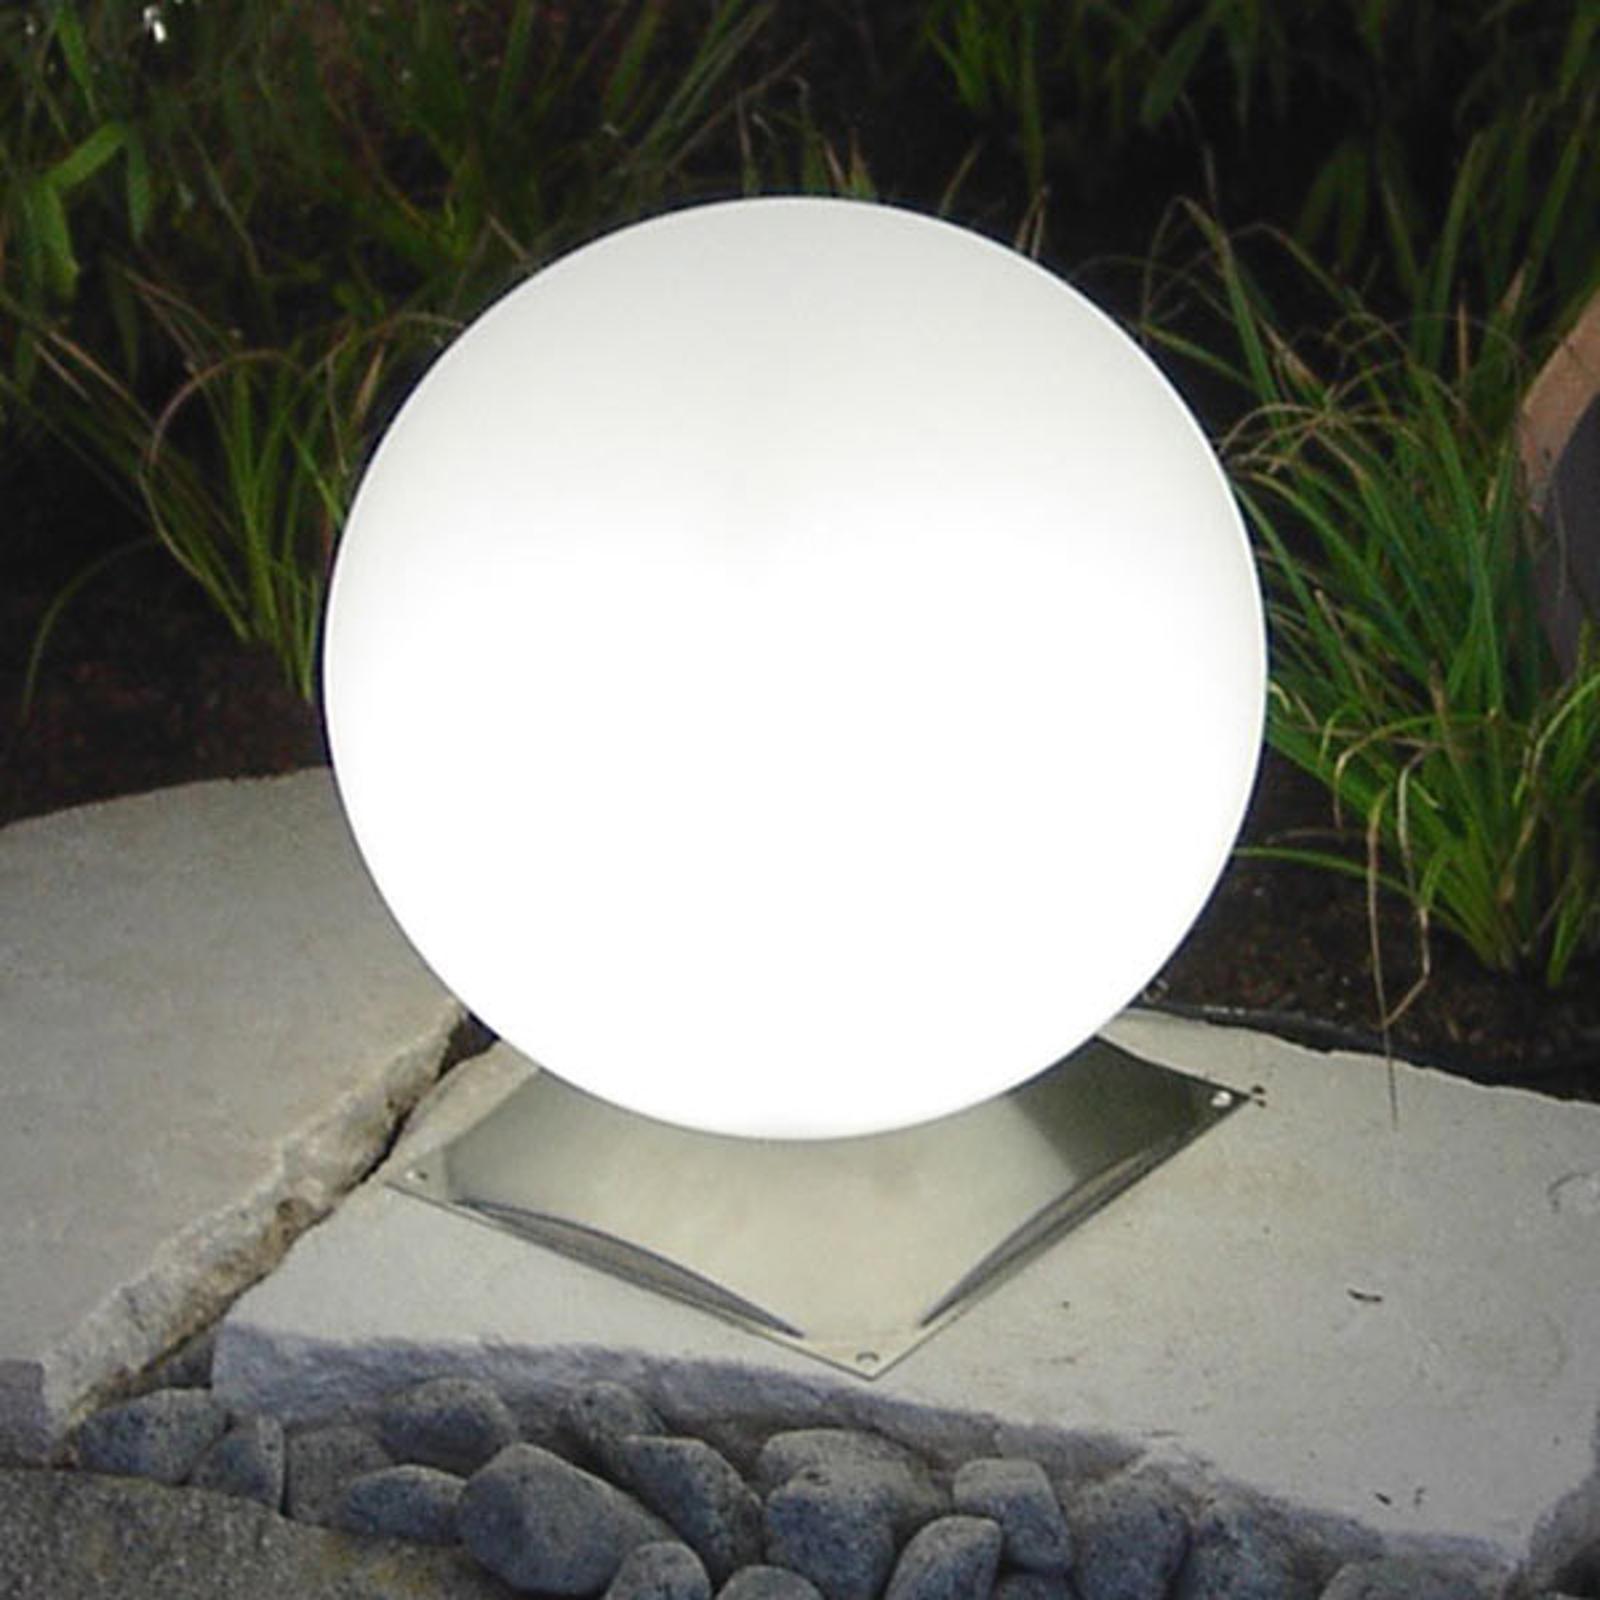 Guľové svietidlo biele podstavec ušľachtilá oceľ_3050035_1